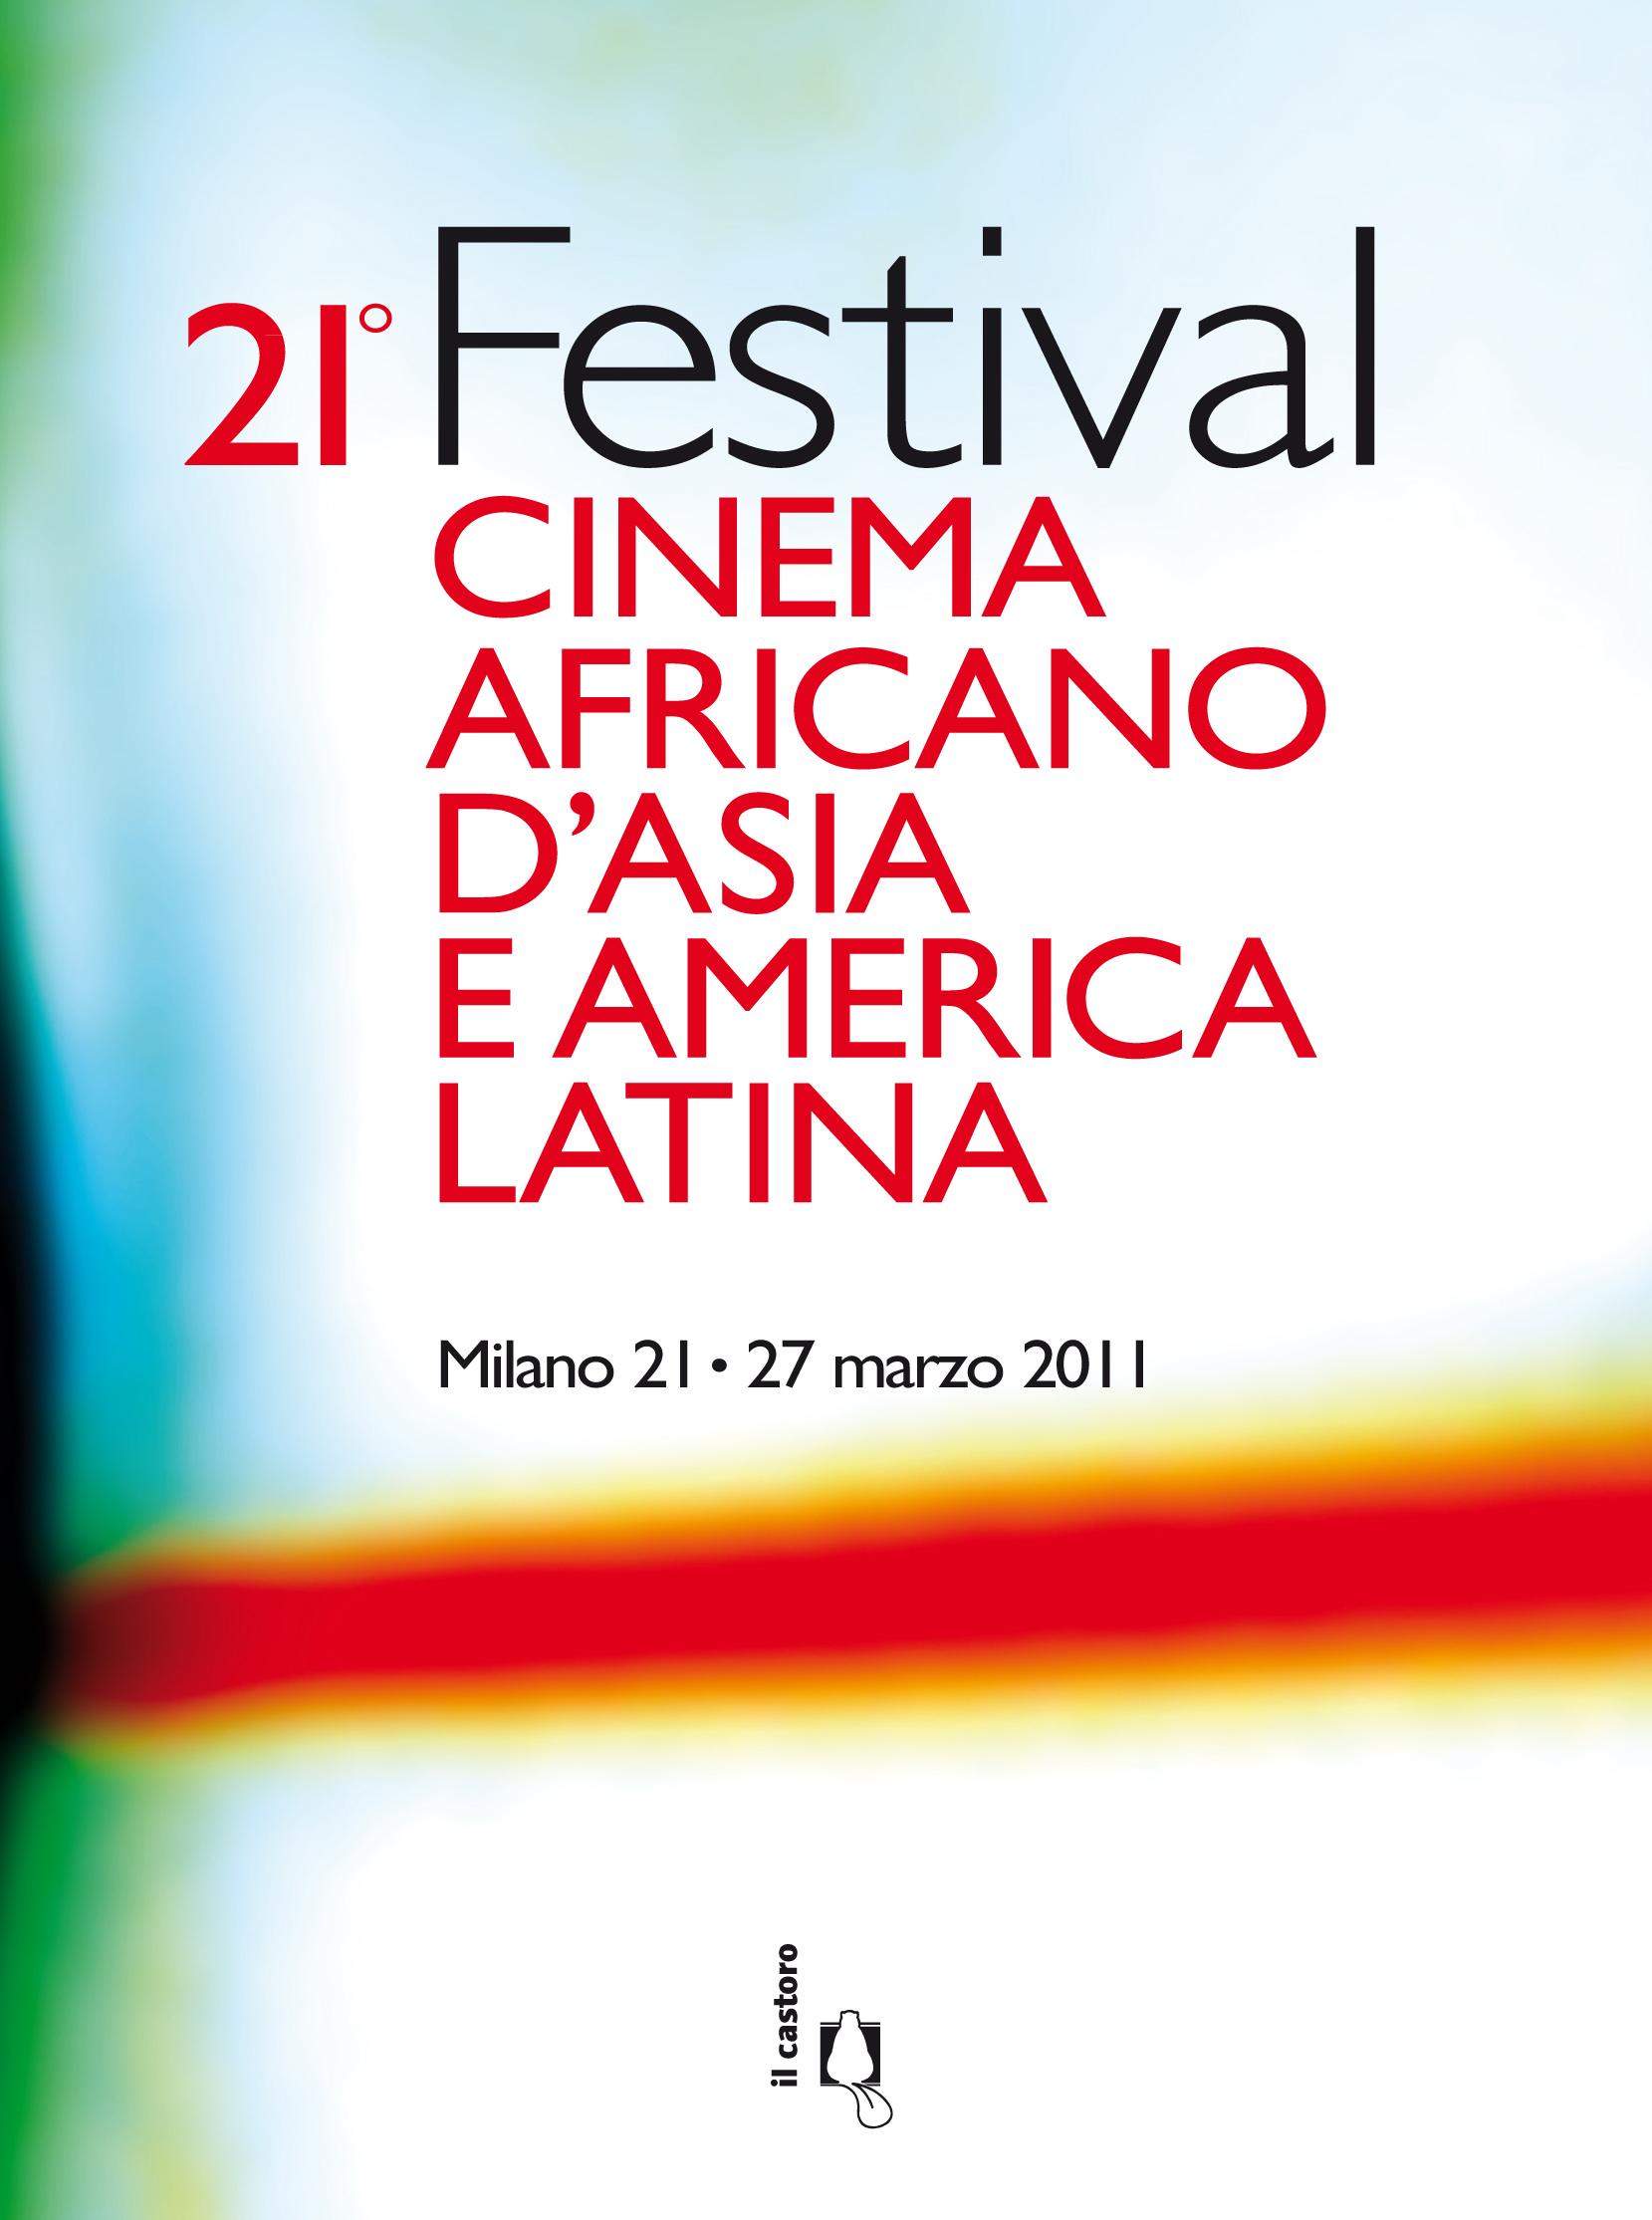 21° FESTIVAL CINEMA AFRICANO D'ASIA E AMERICA LATINA